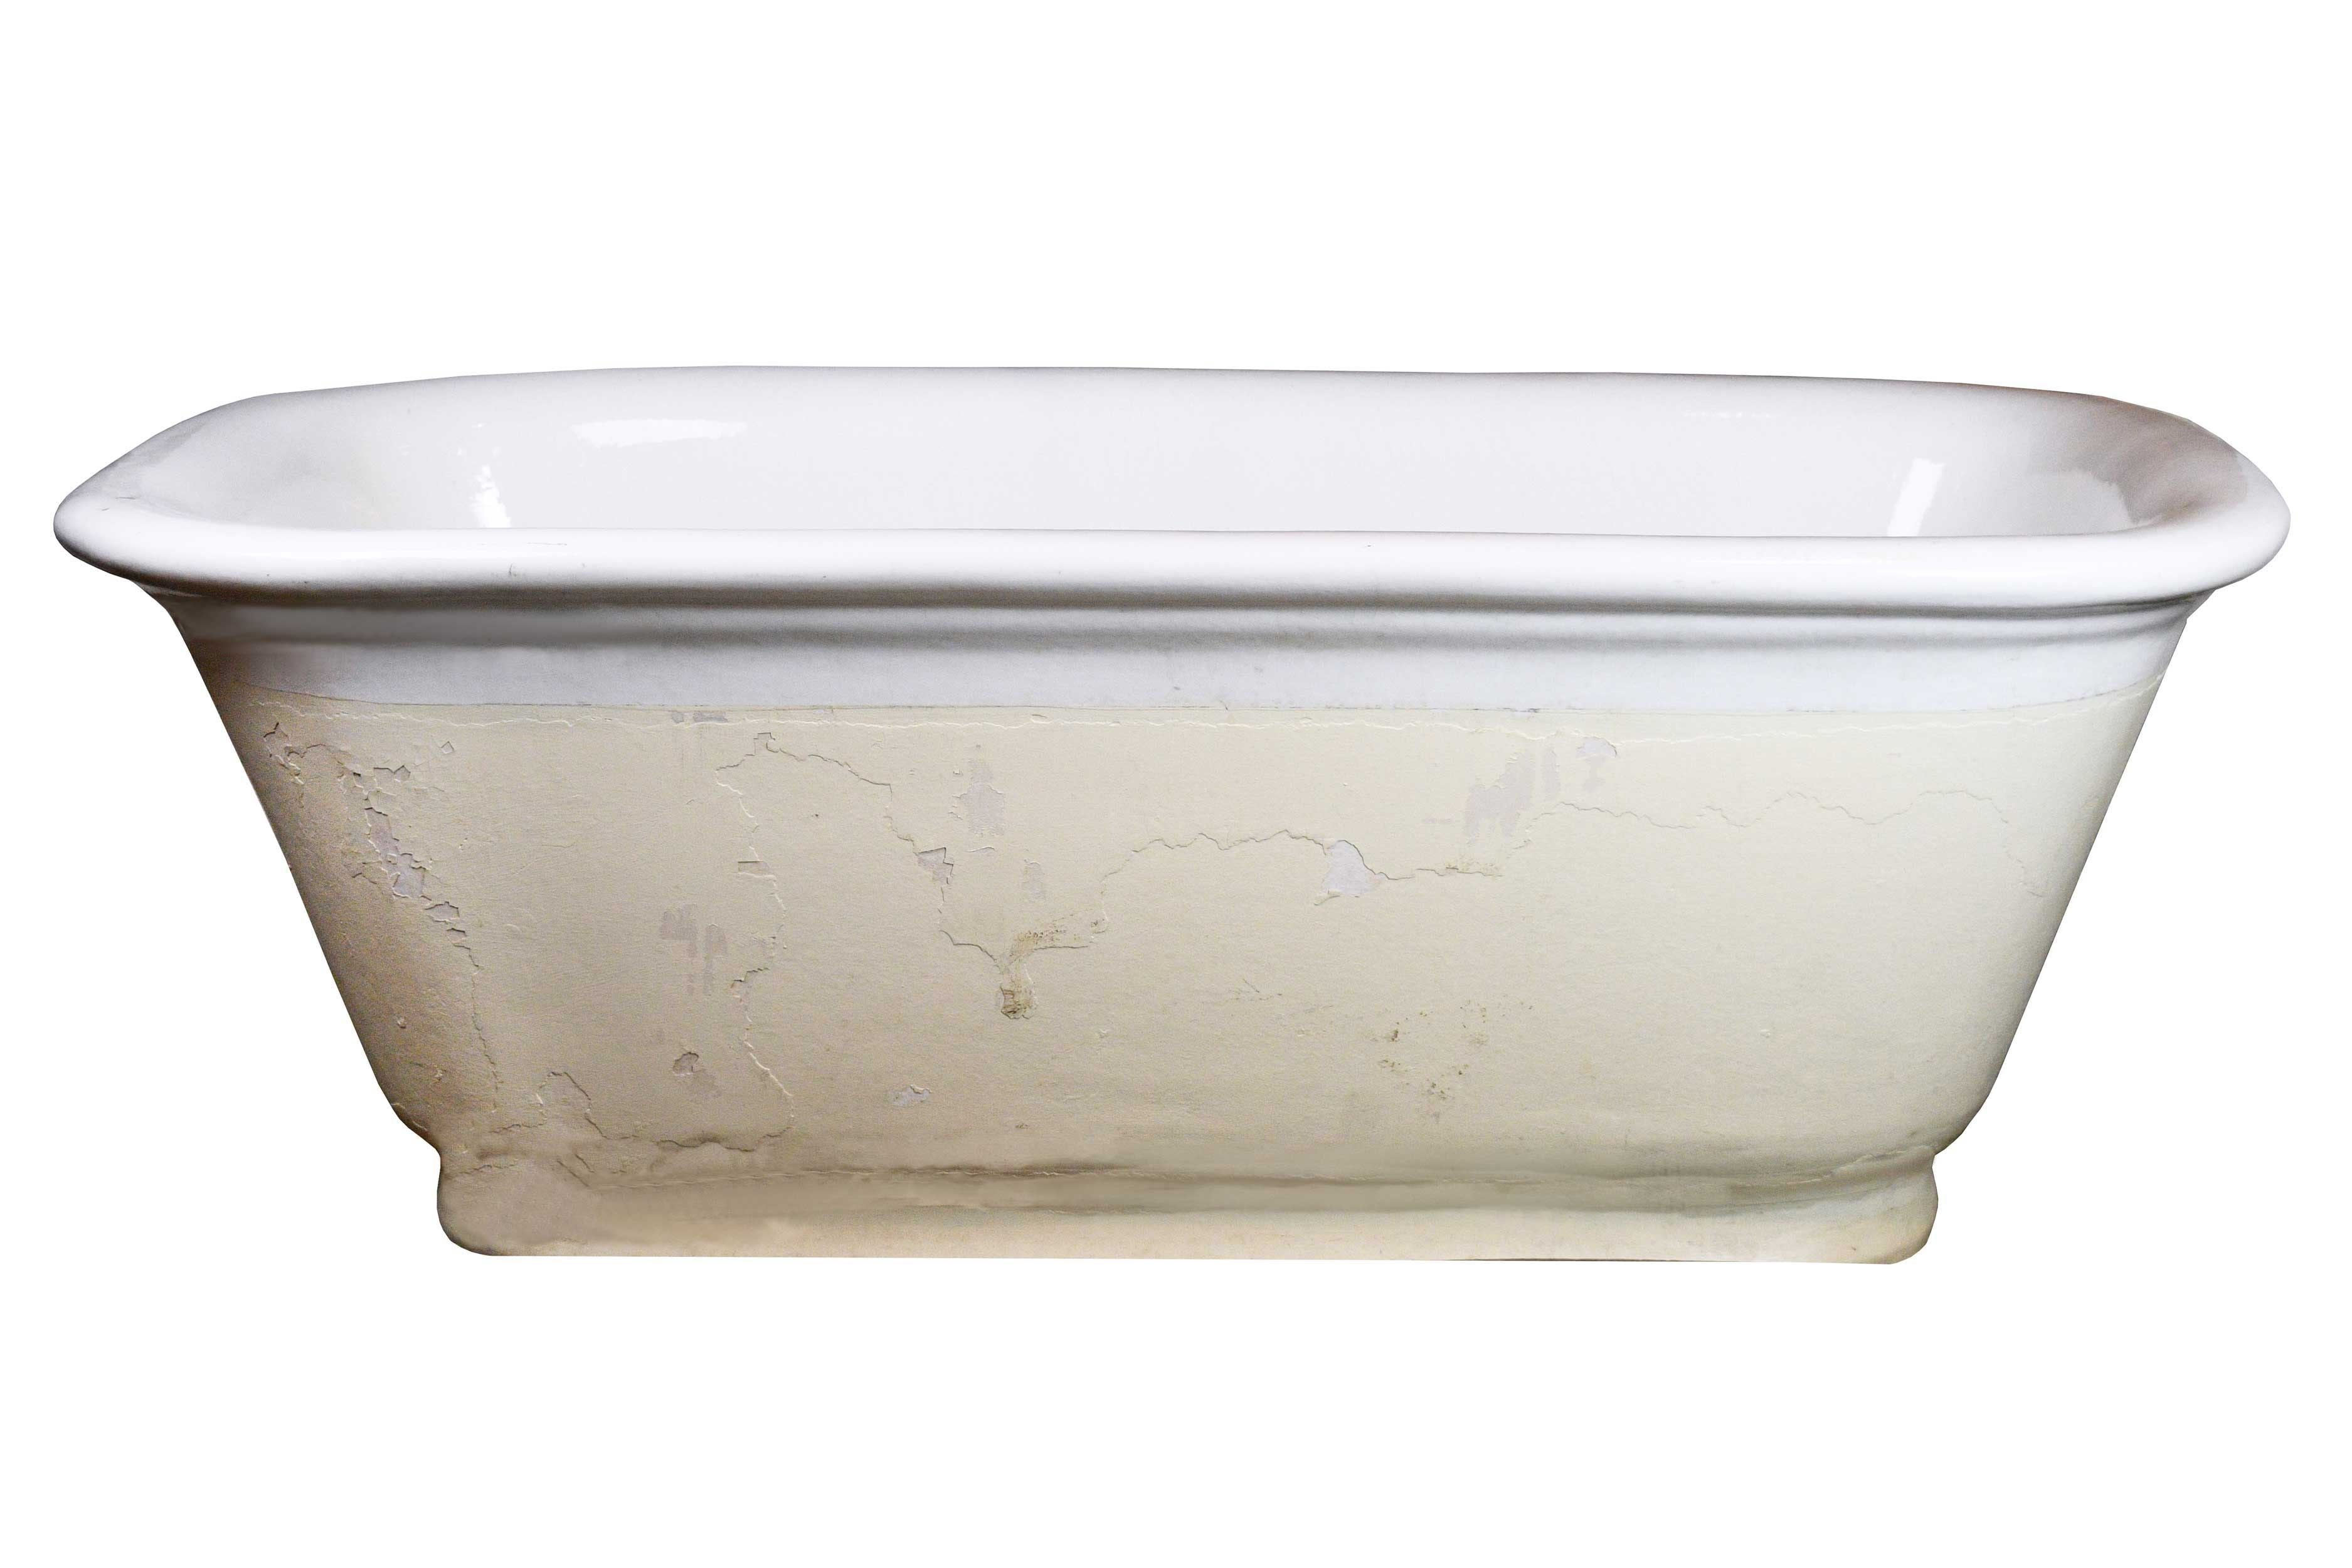 Porcelain Center Drain Tub By Architectural Antiques Free Standing Bath Tub Tub Steam Showers Bathroom